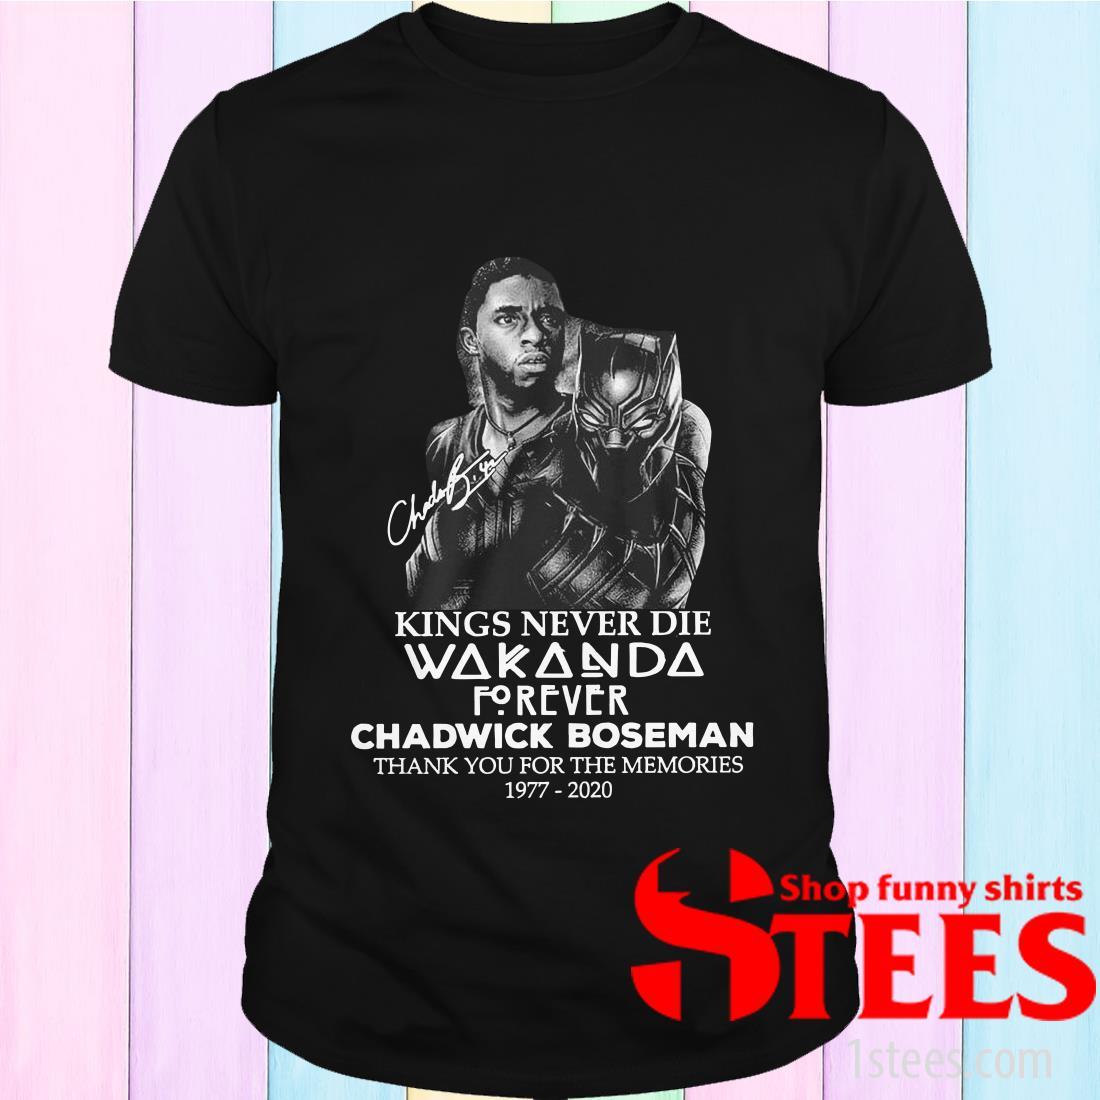 Kings Never Die Wakanda Forever Chadwick Boseman Thank You For The Memories 1977-2020 Shirt